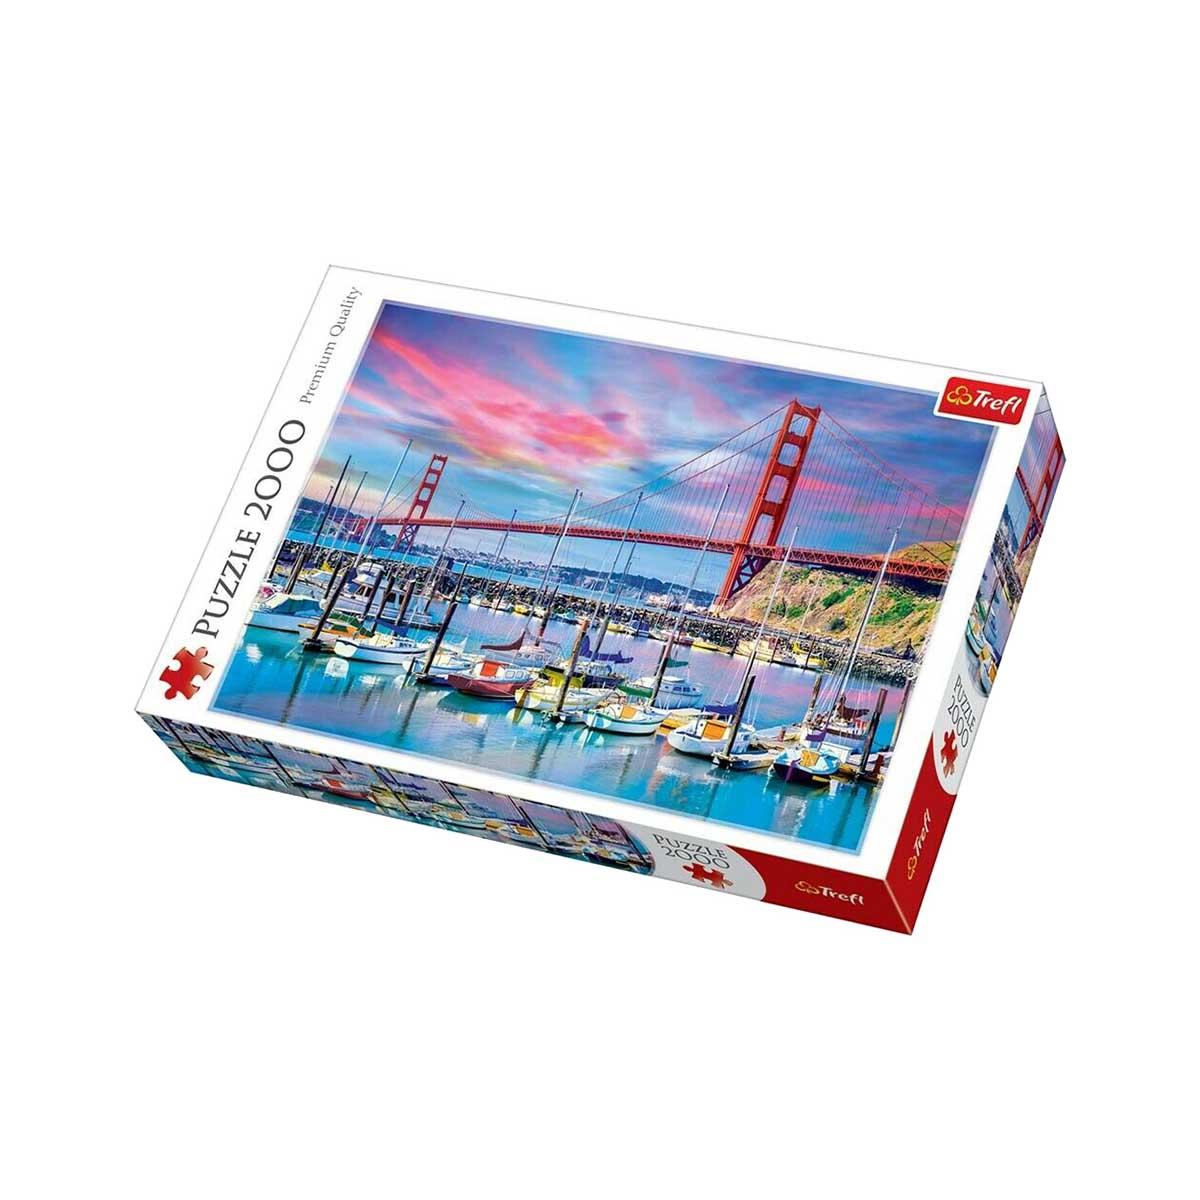 Golden Gate Bridge, Sf Landmarks / Monuments Jigsaw Puzzle